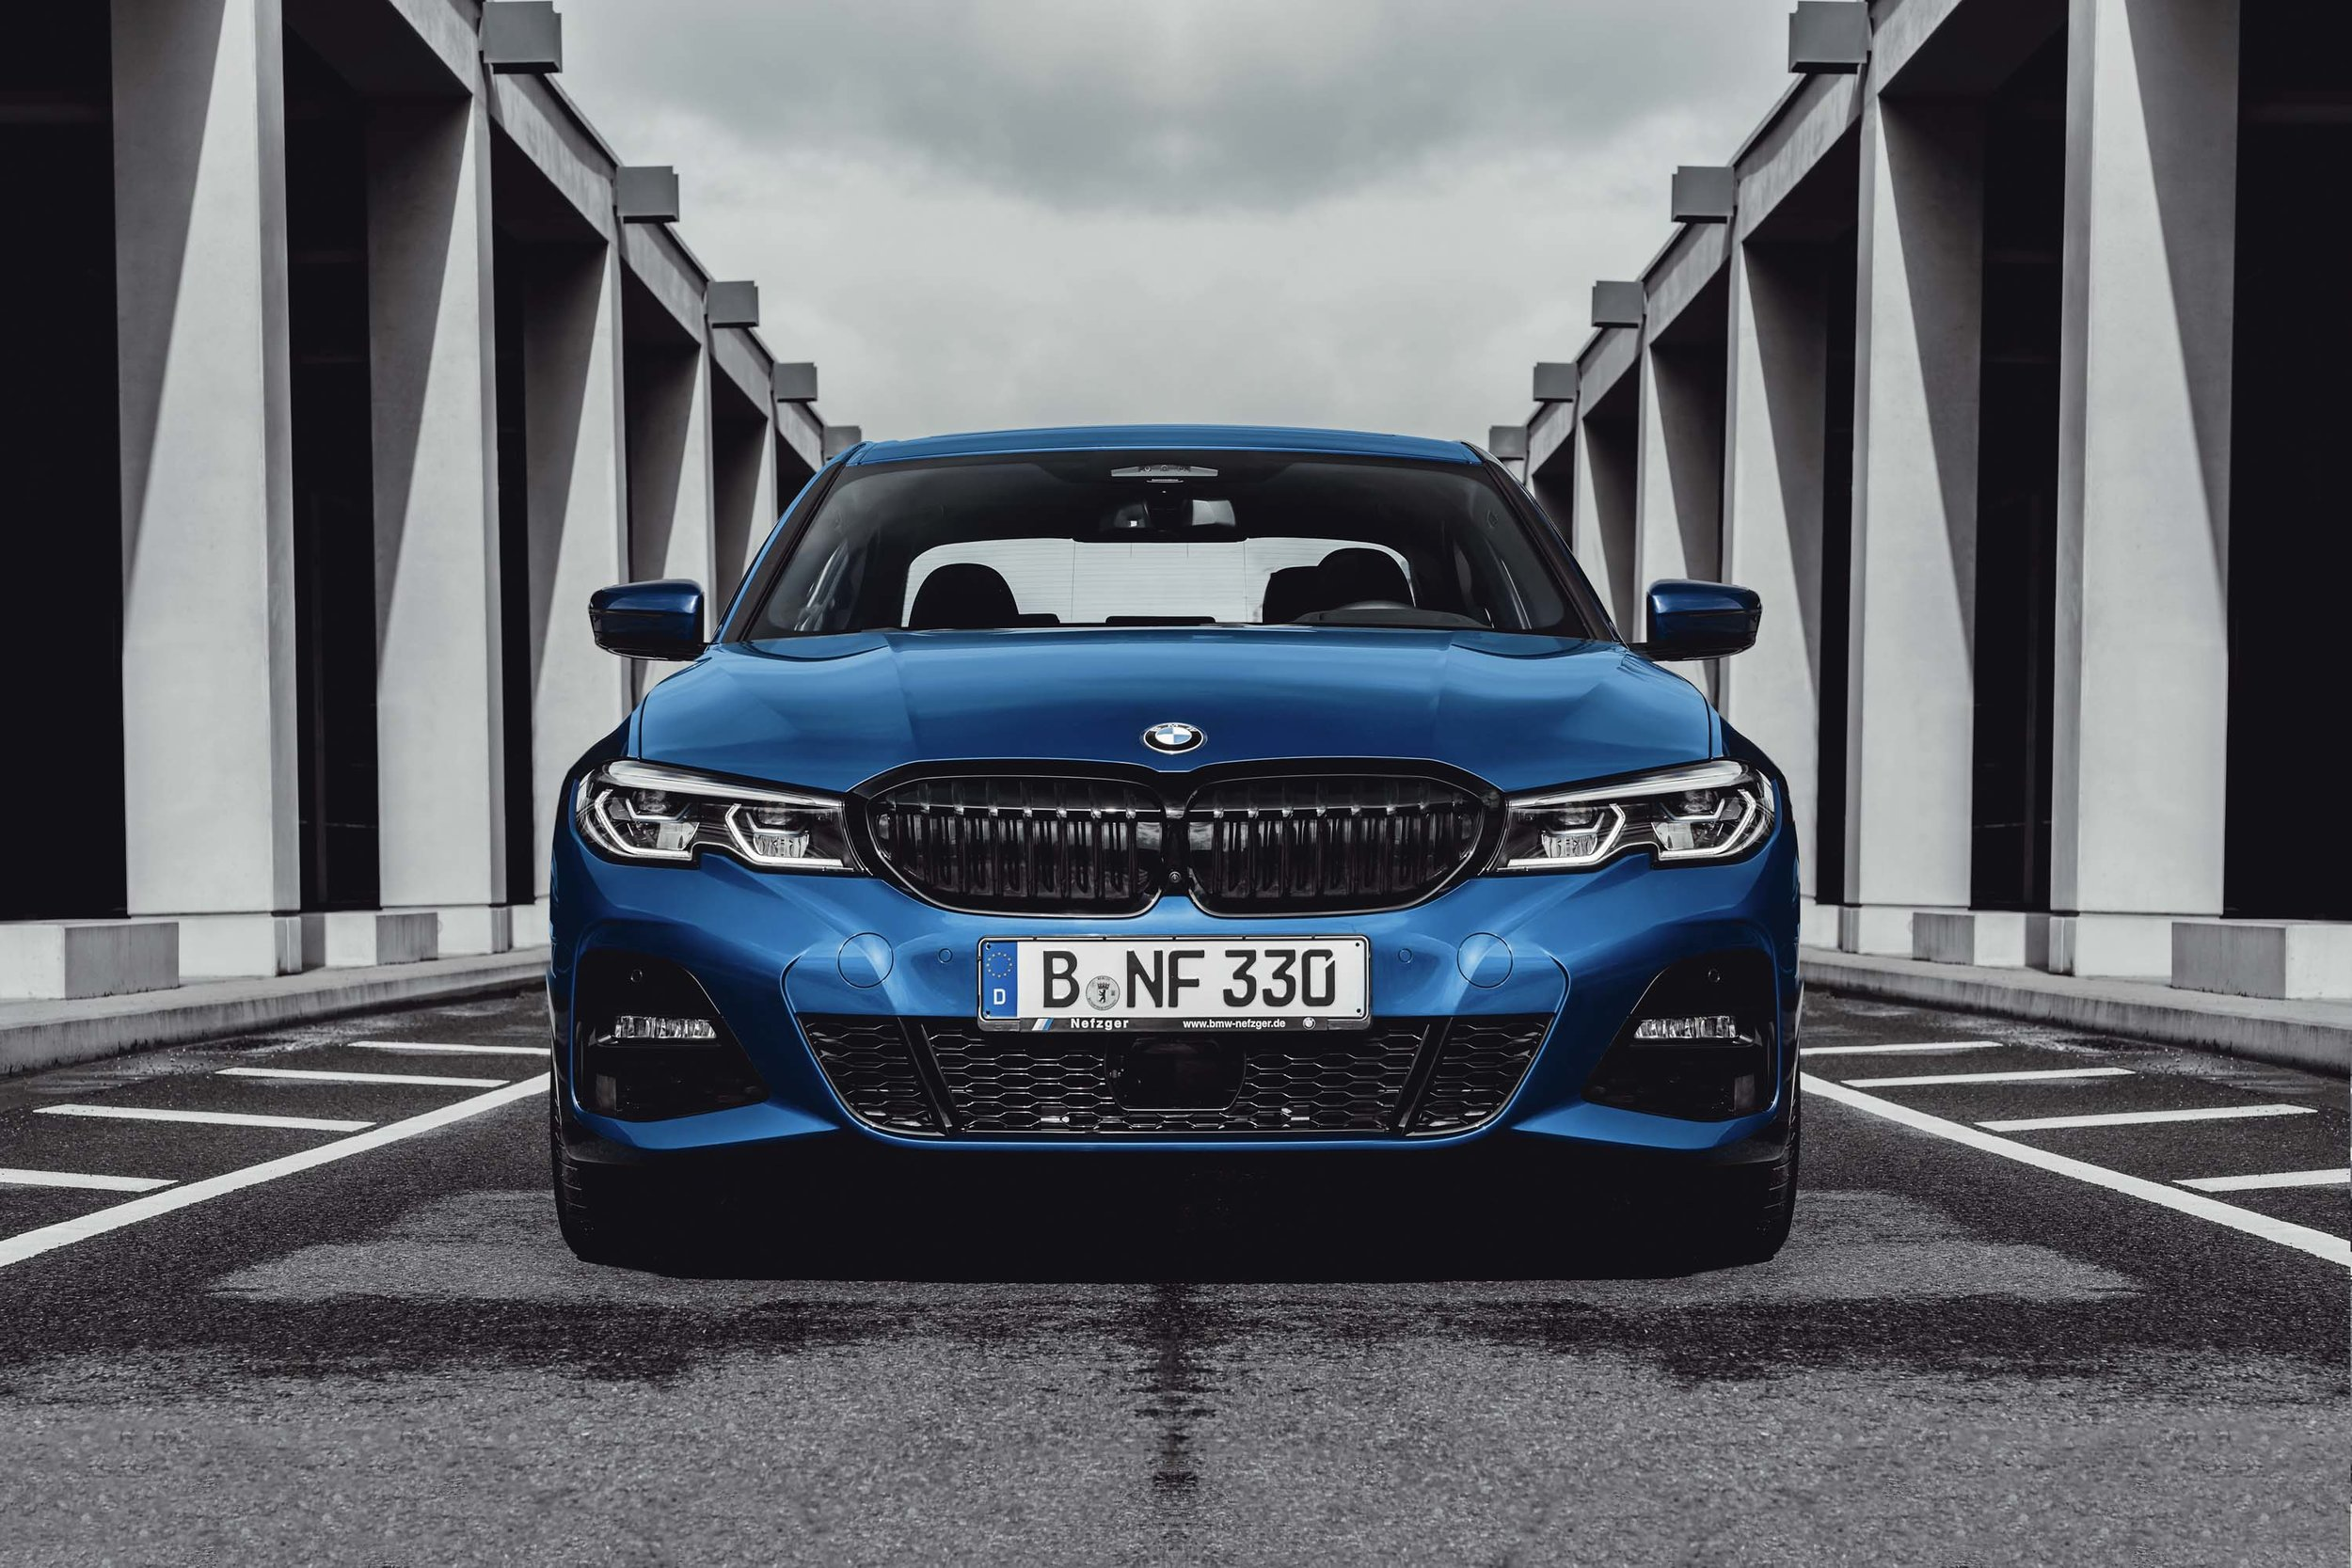 Maximilian_Otto_BMW_330i_20190414_01_WEB.jpg